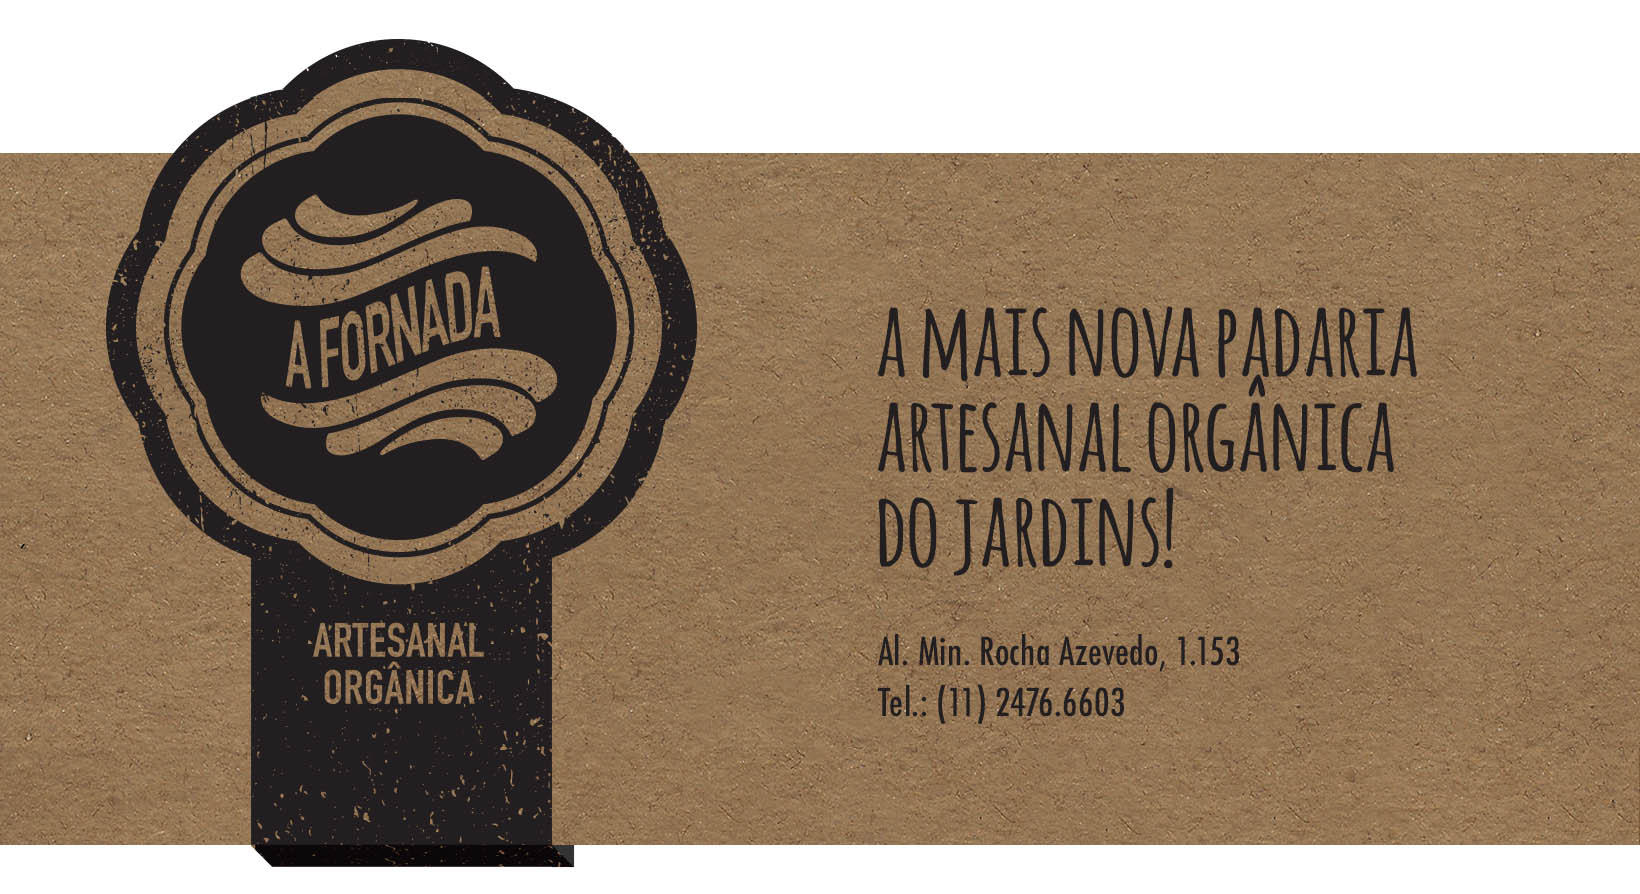 a-fornada-padaria-artesanal-organica.jpg